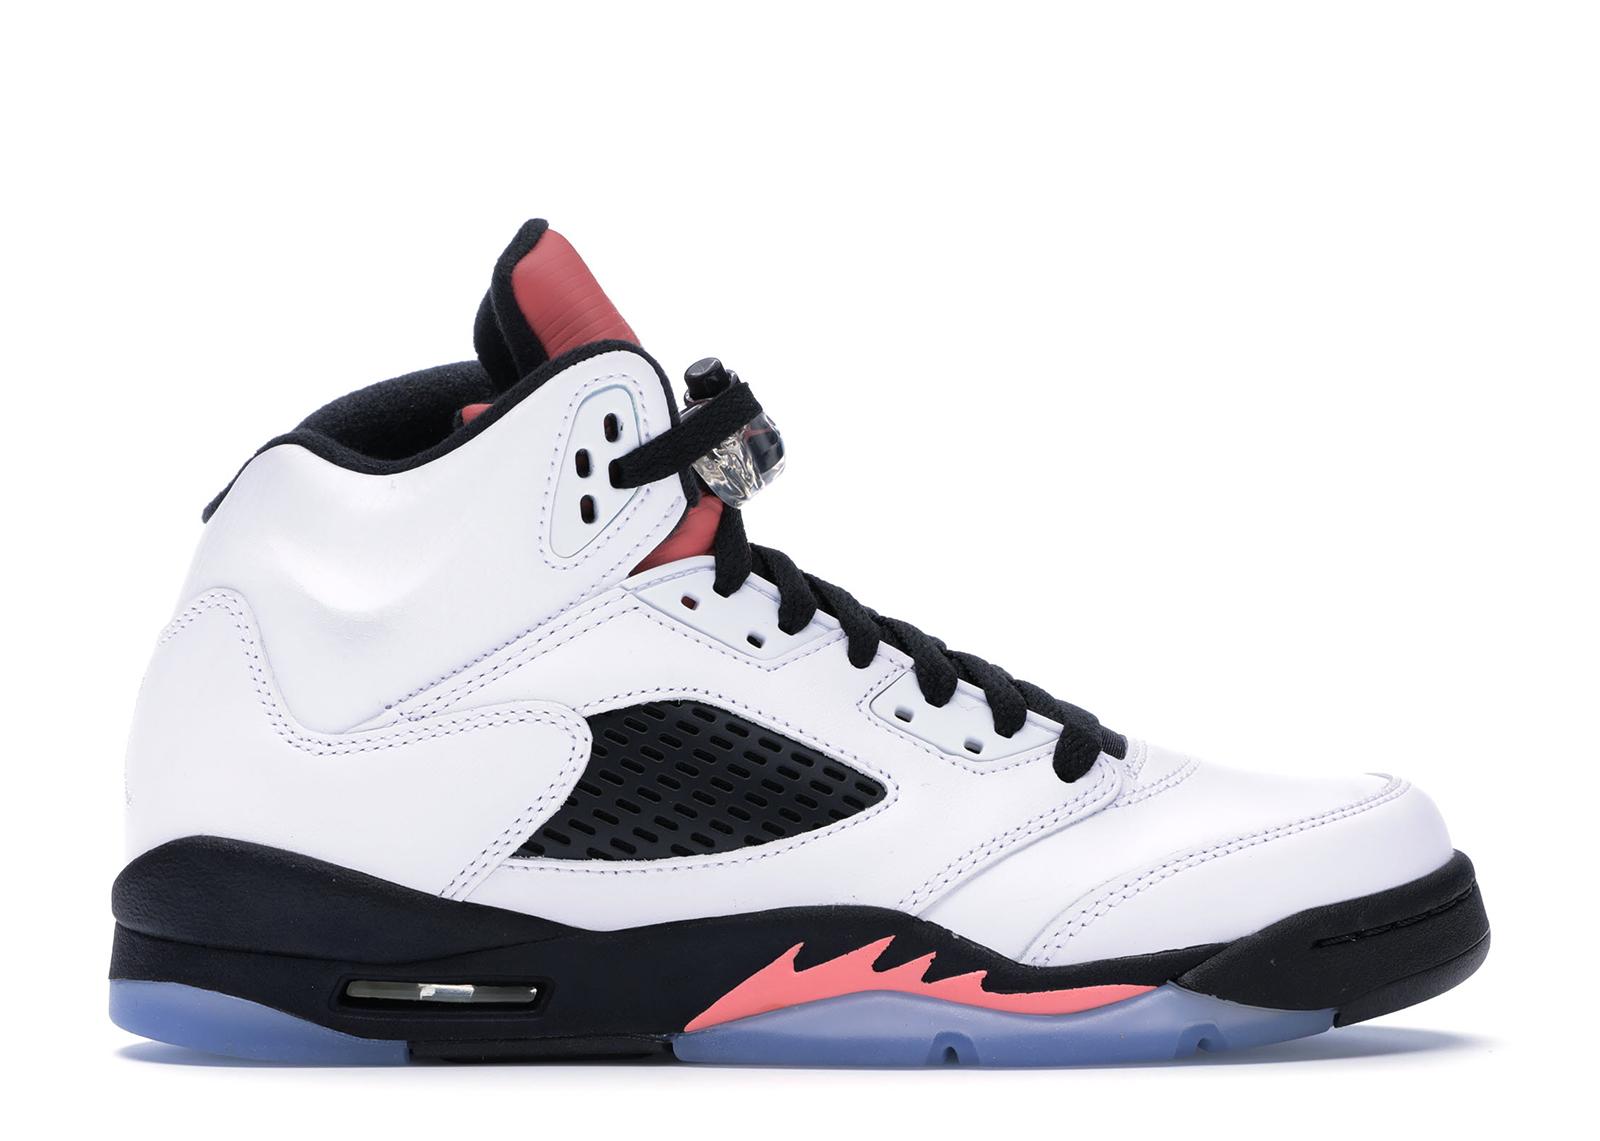 Jordan 5 Retro Sunblush (GS) - 440892-115